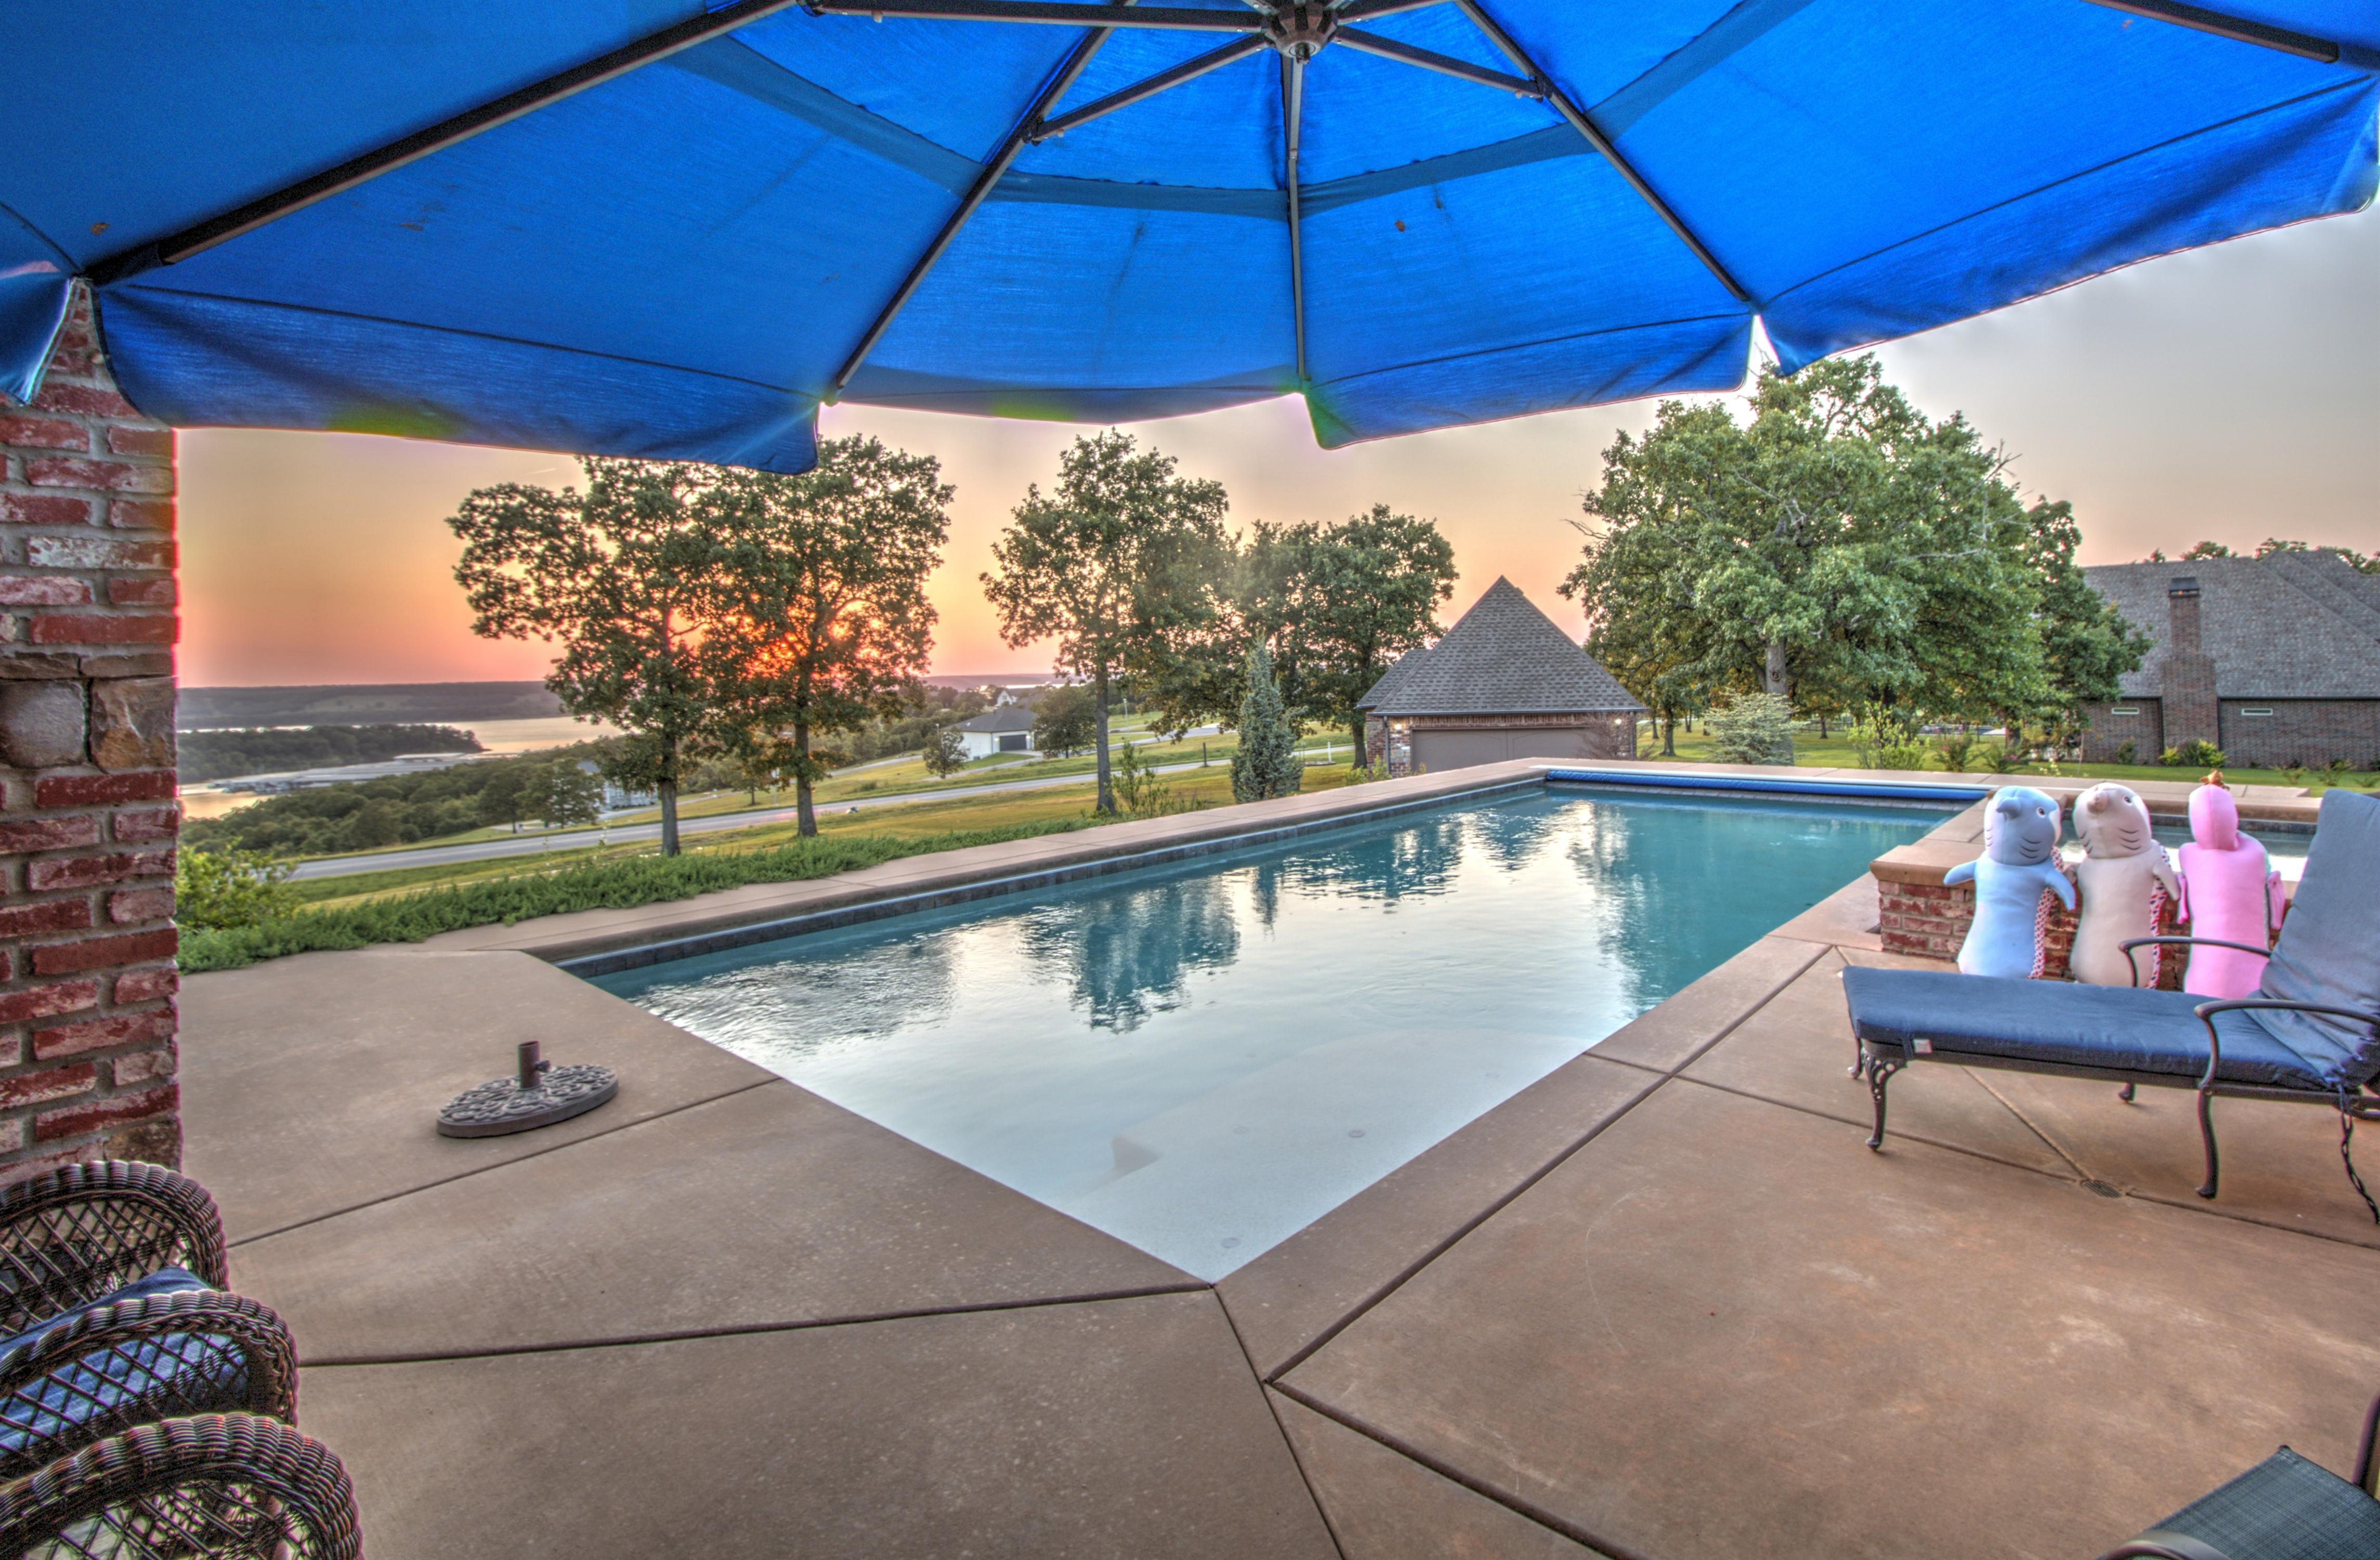 12270 Sunset View Property Photo 31